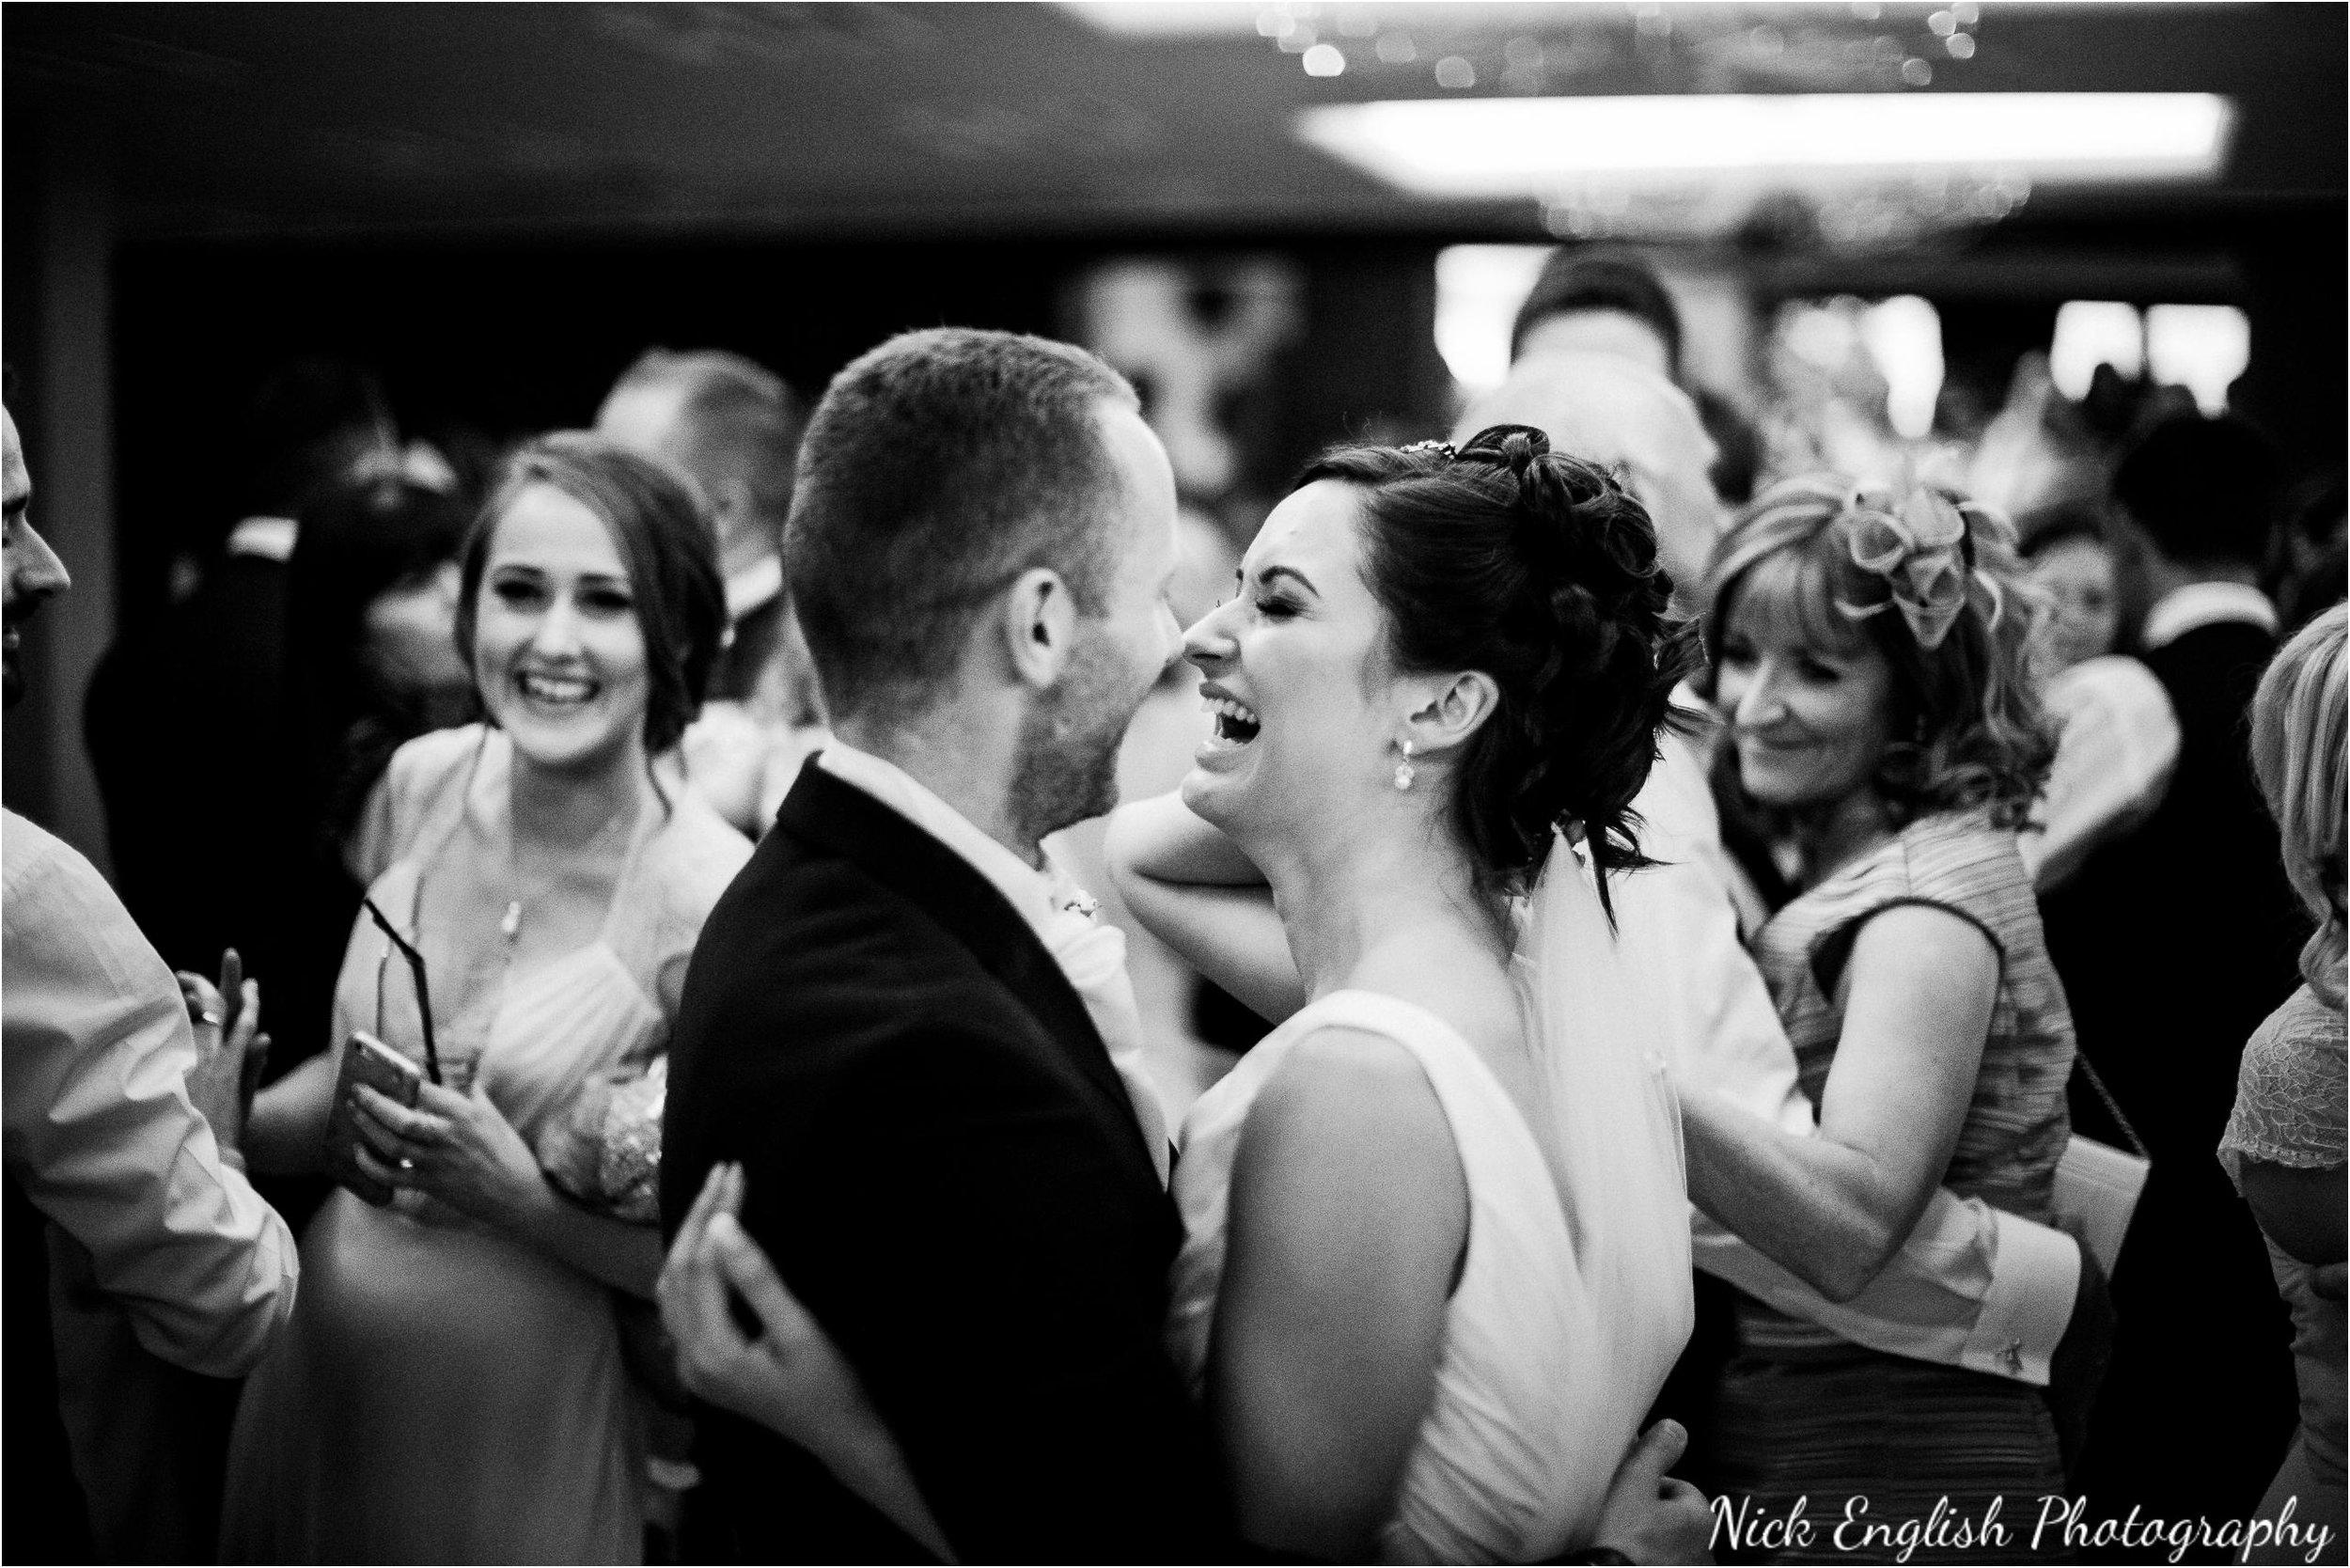 Emily David Wedding Photographs at Barton Grange Preston by Nick English Photography 229jpg.jpeg